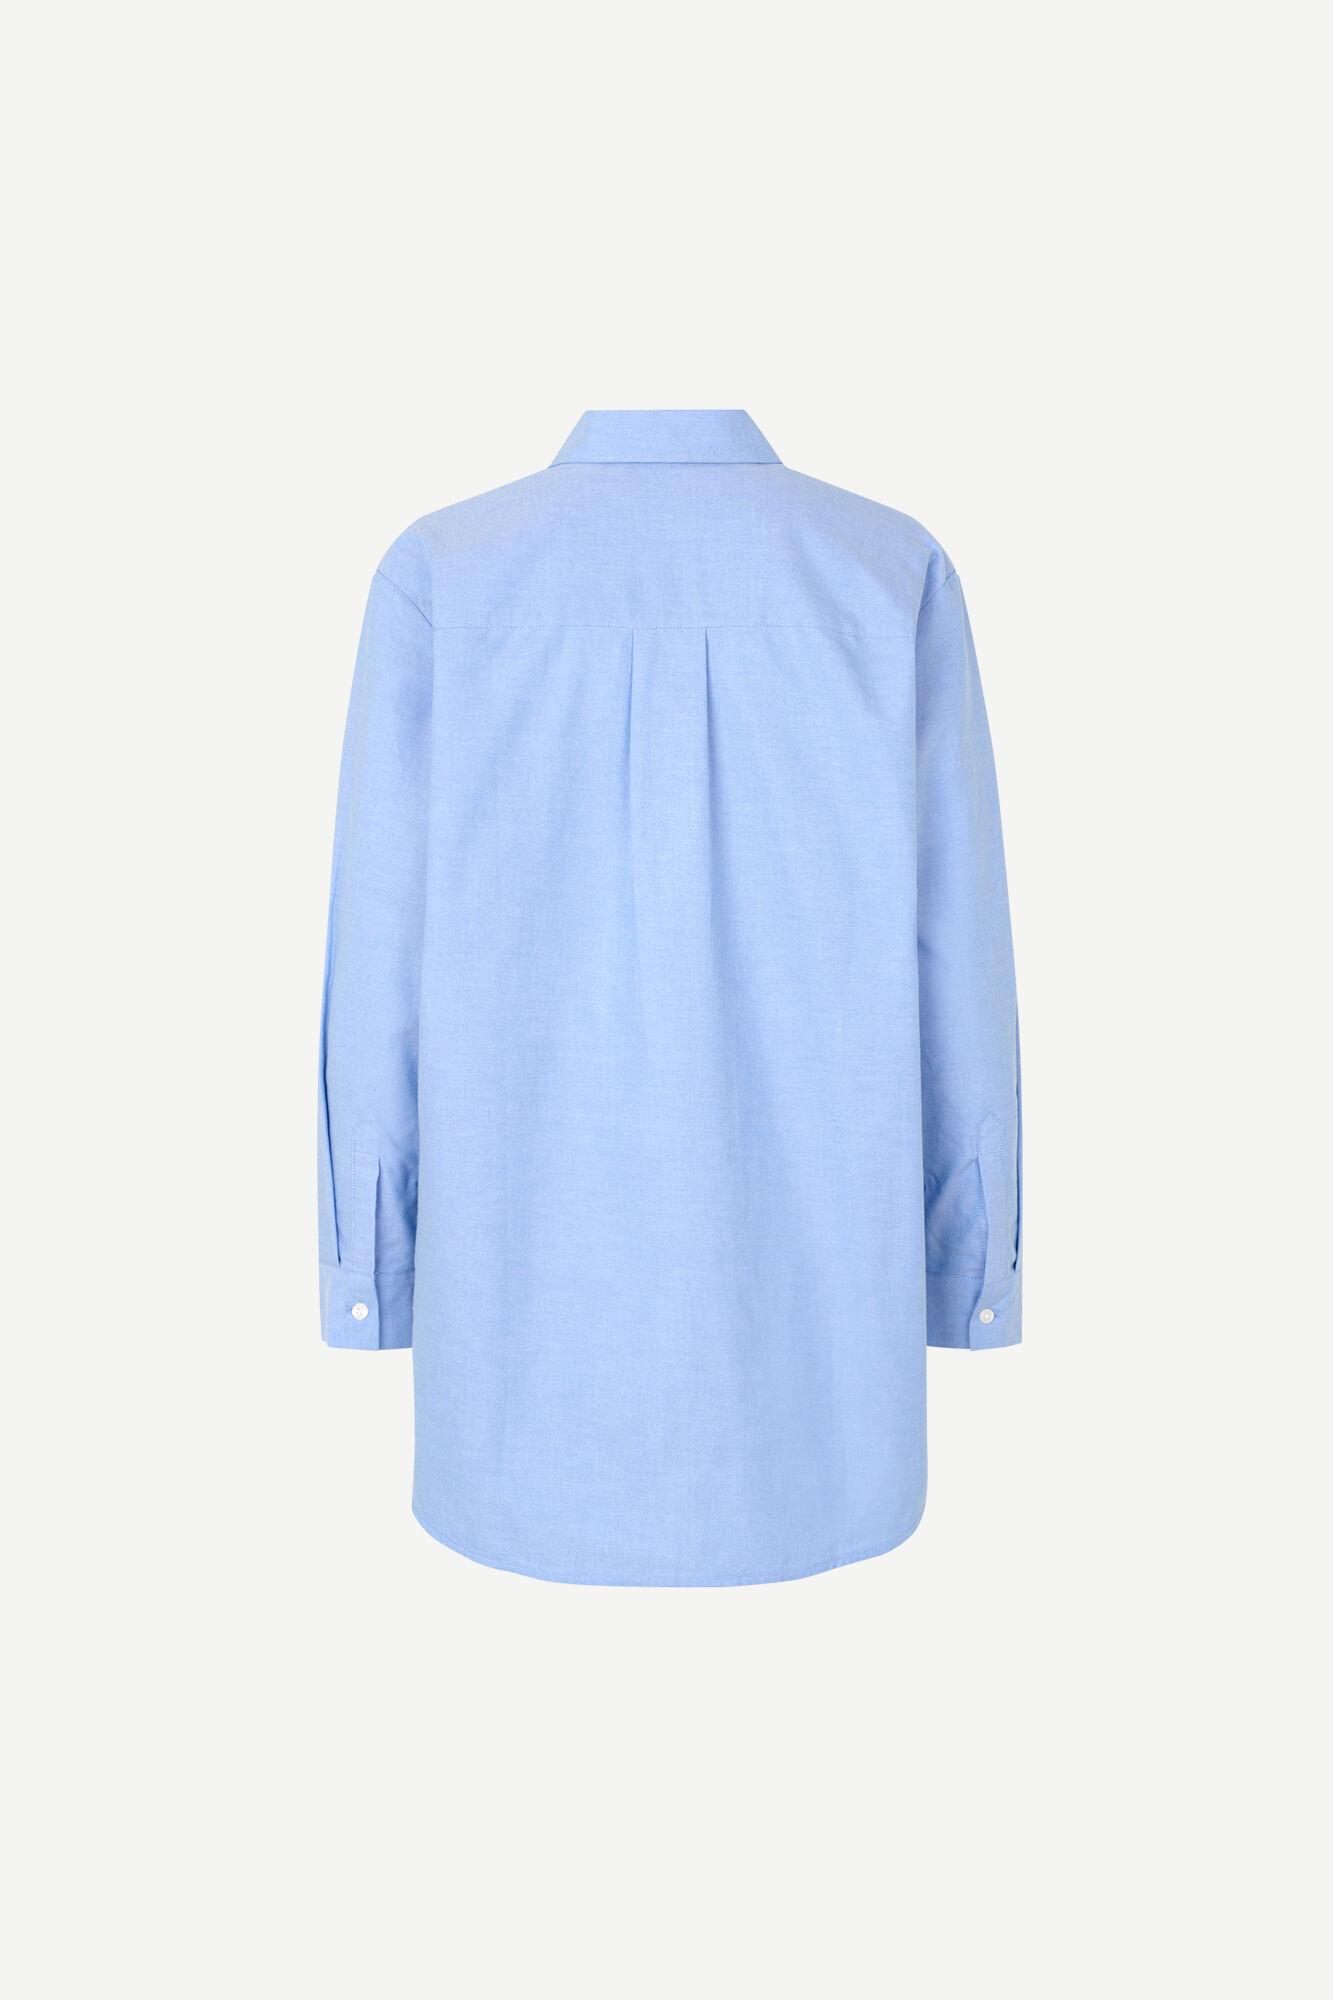 Haley shirt 13163